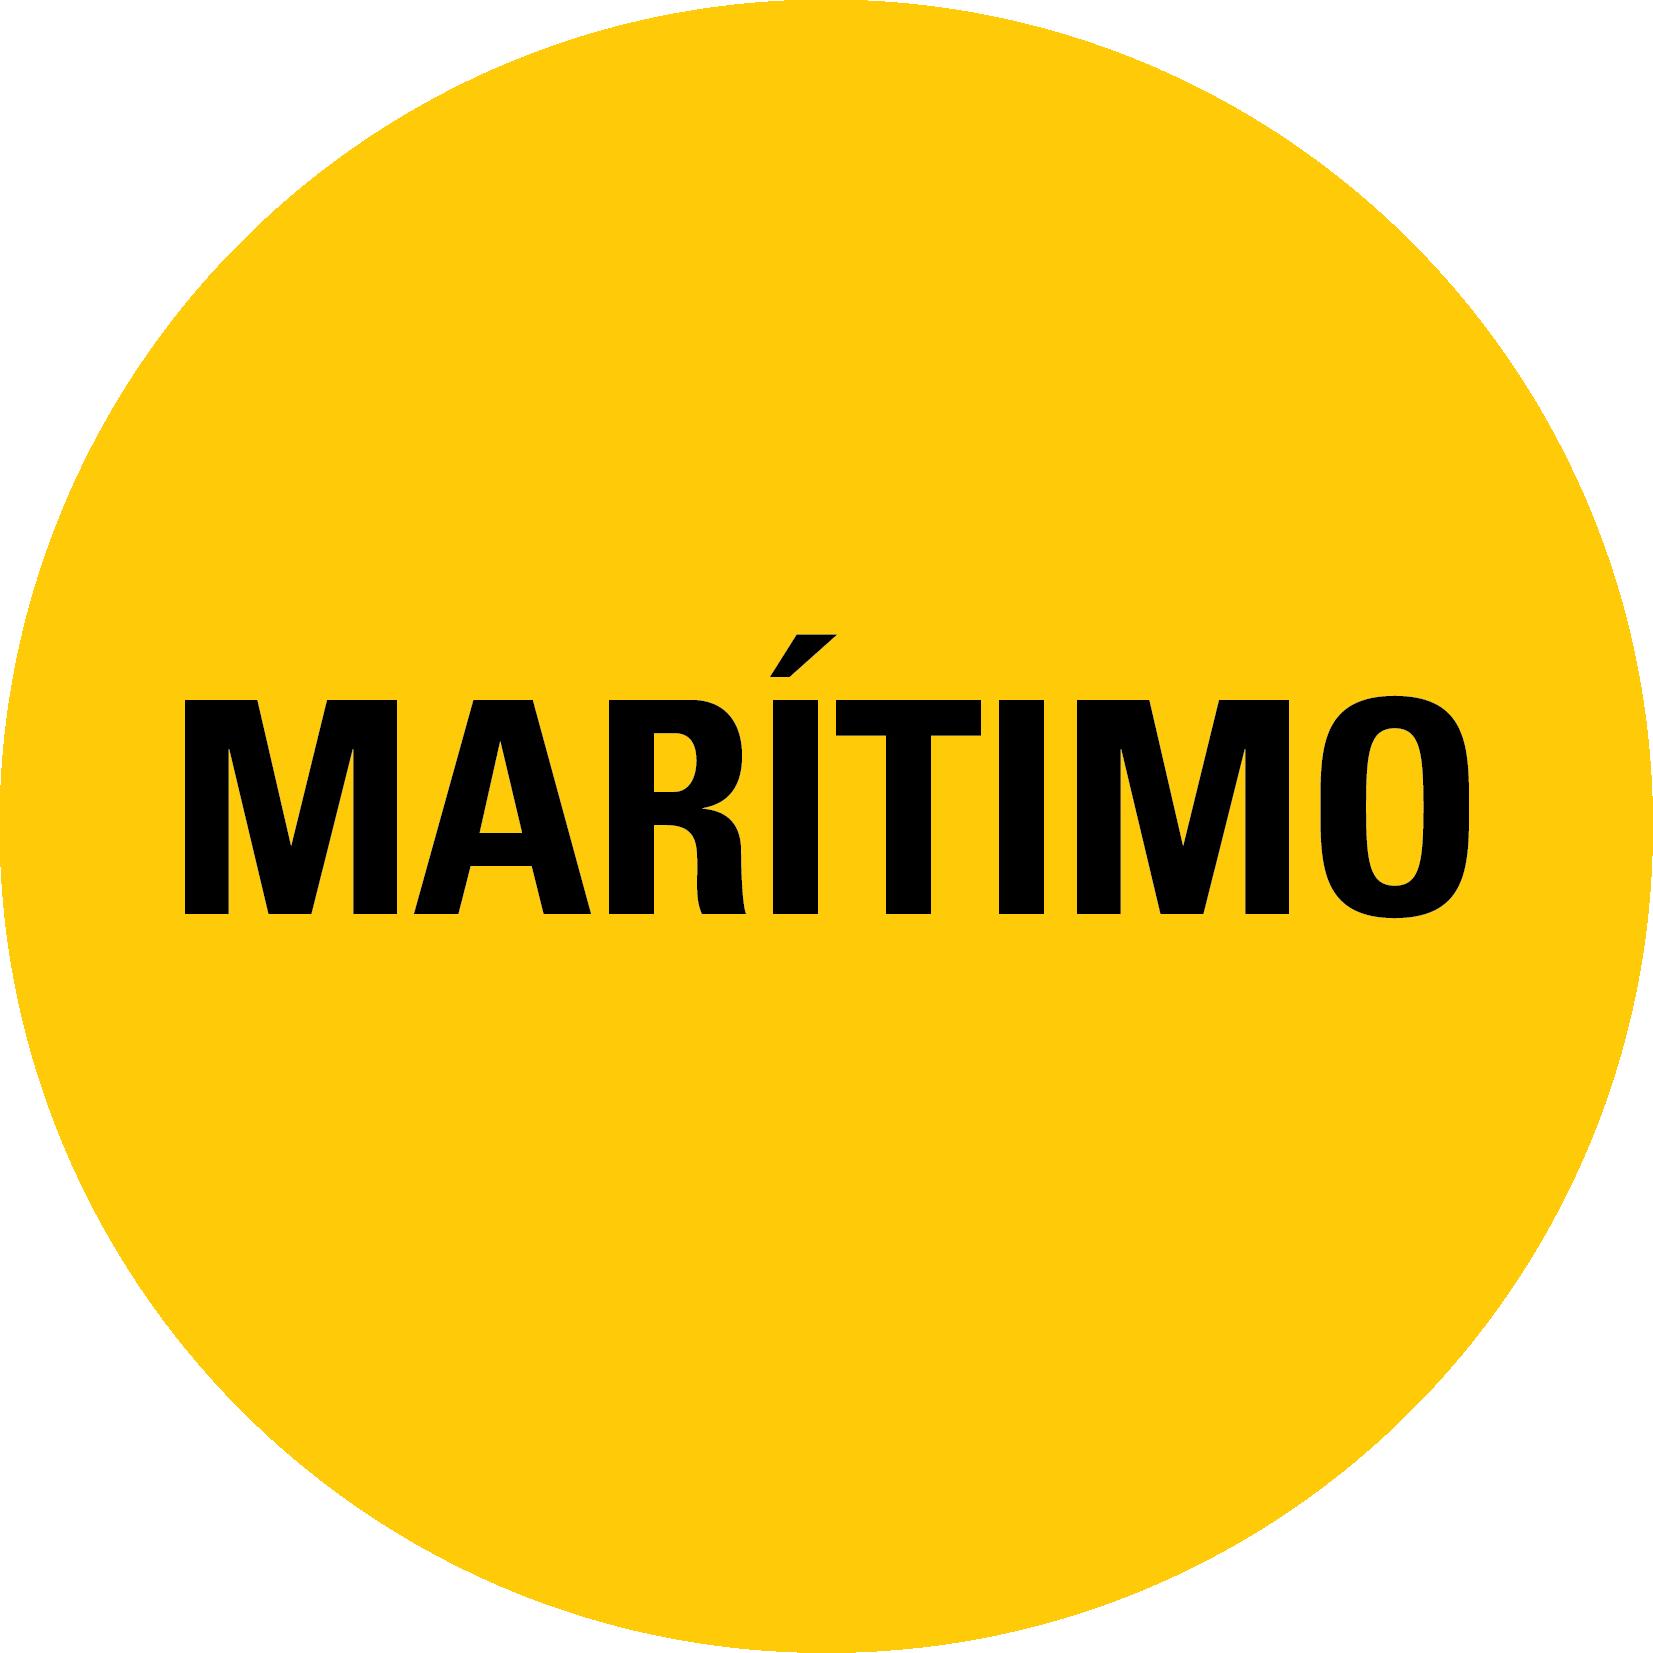 Marítimo